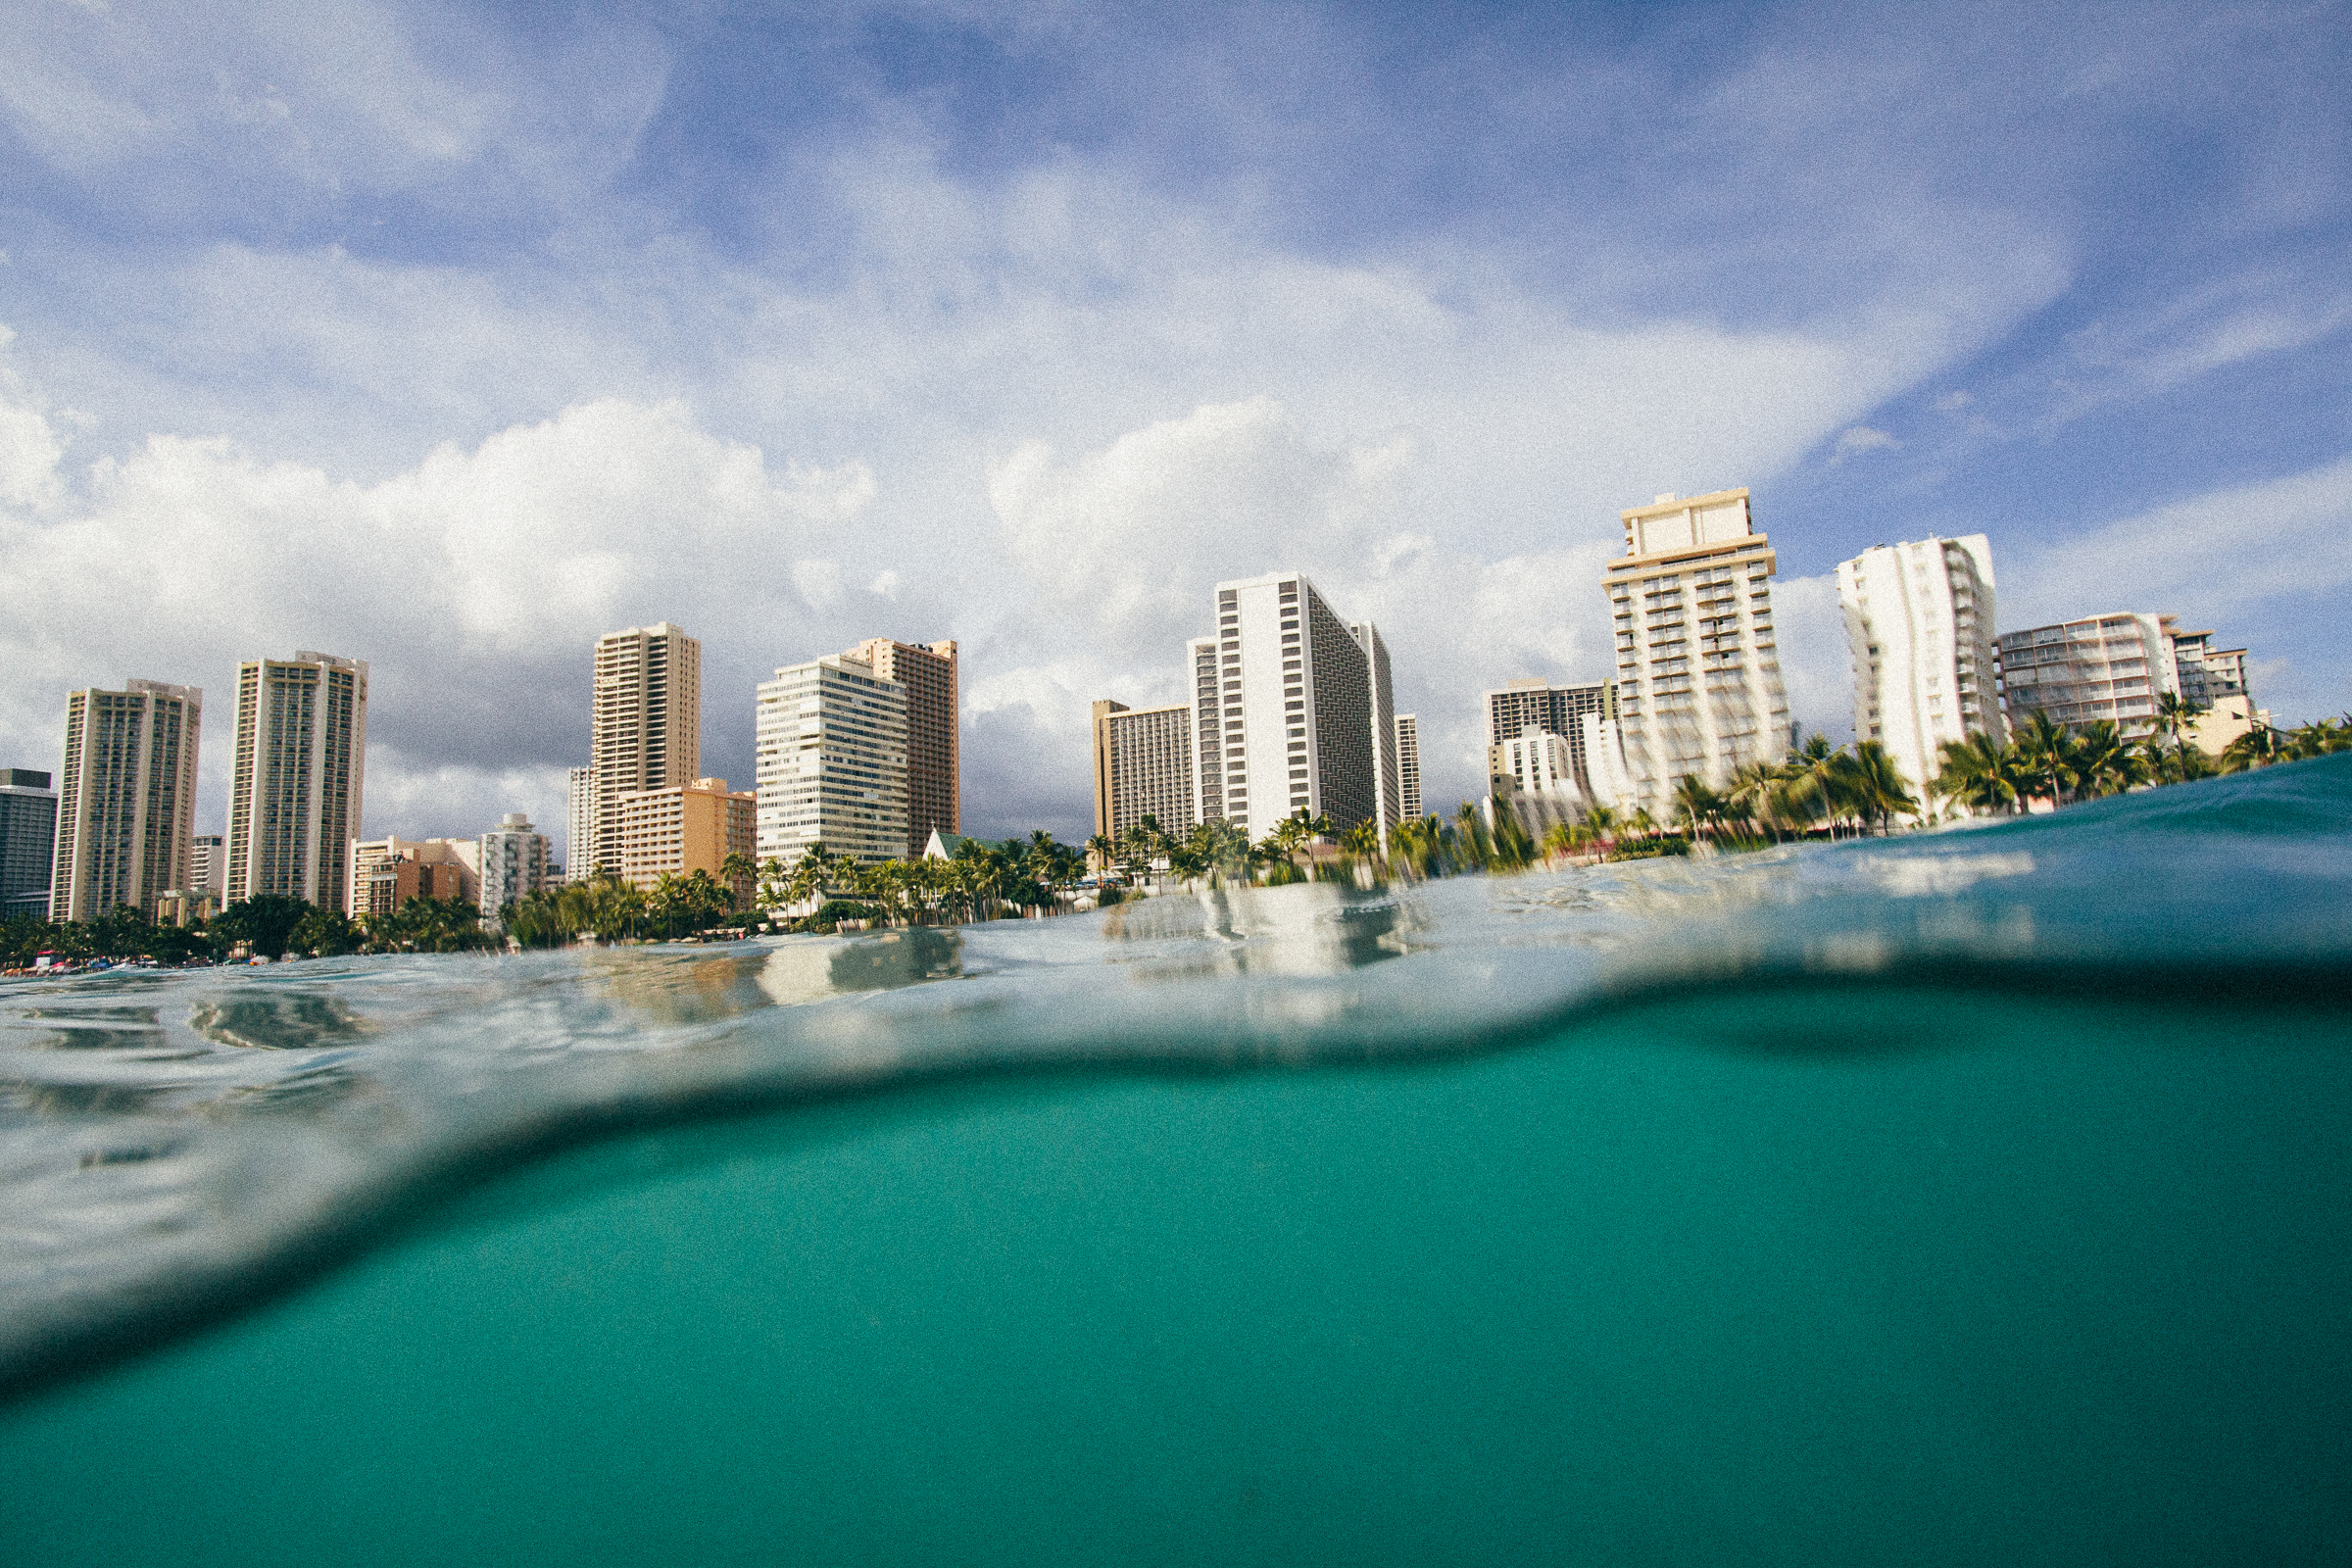 Honolulu from the ocean